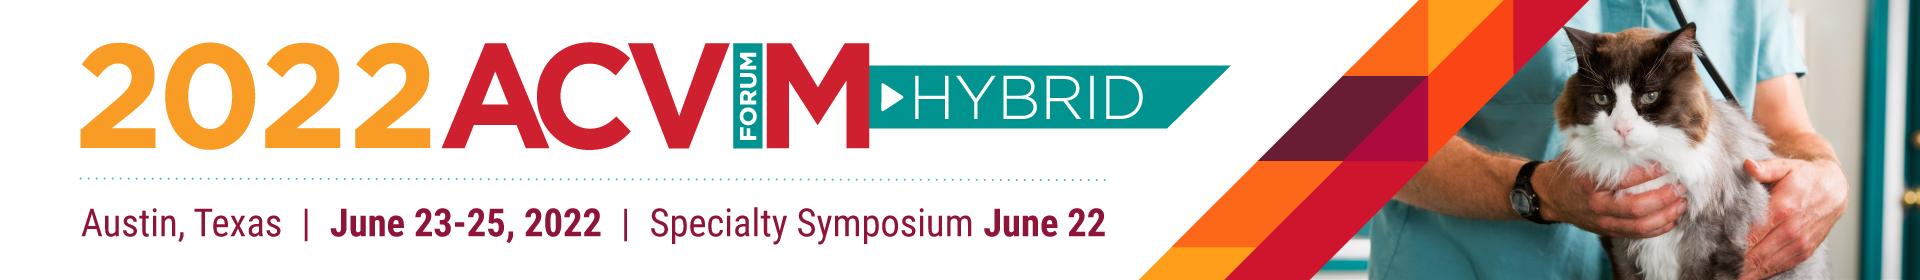 2022 ACVIM Forum Event Banner